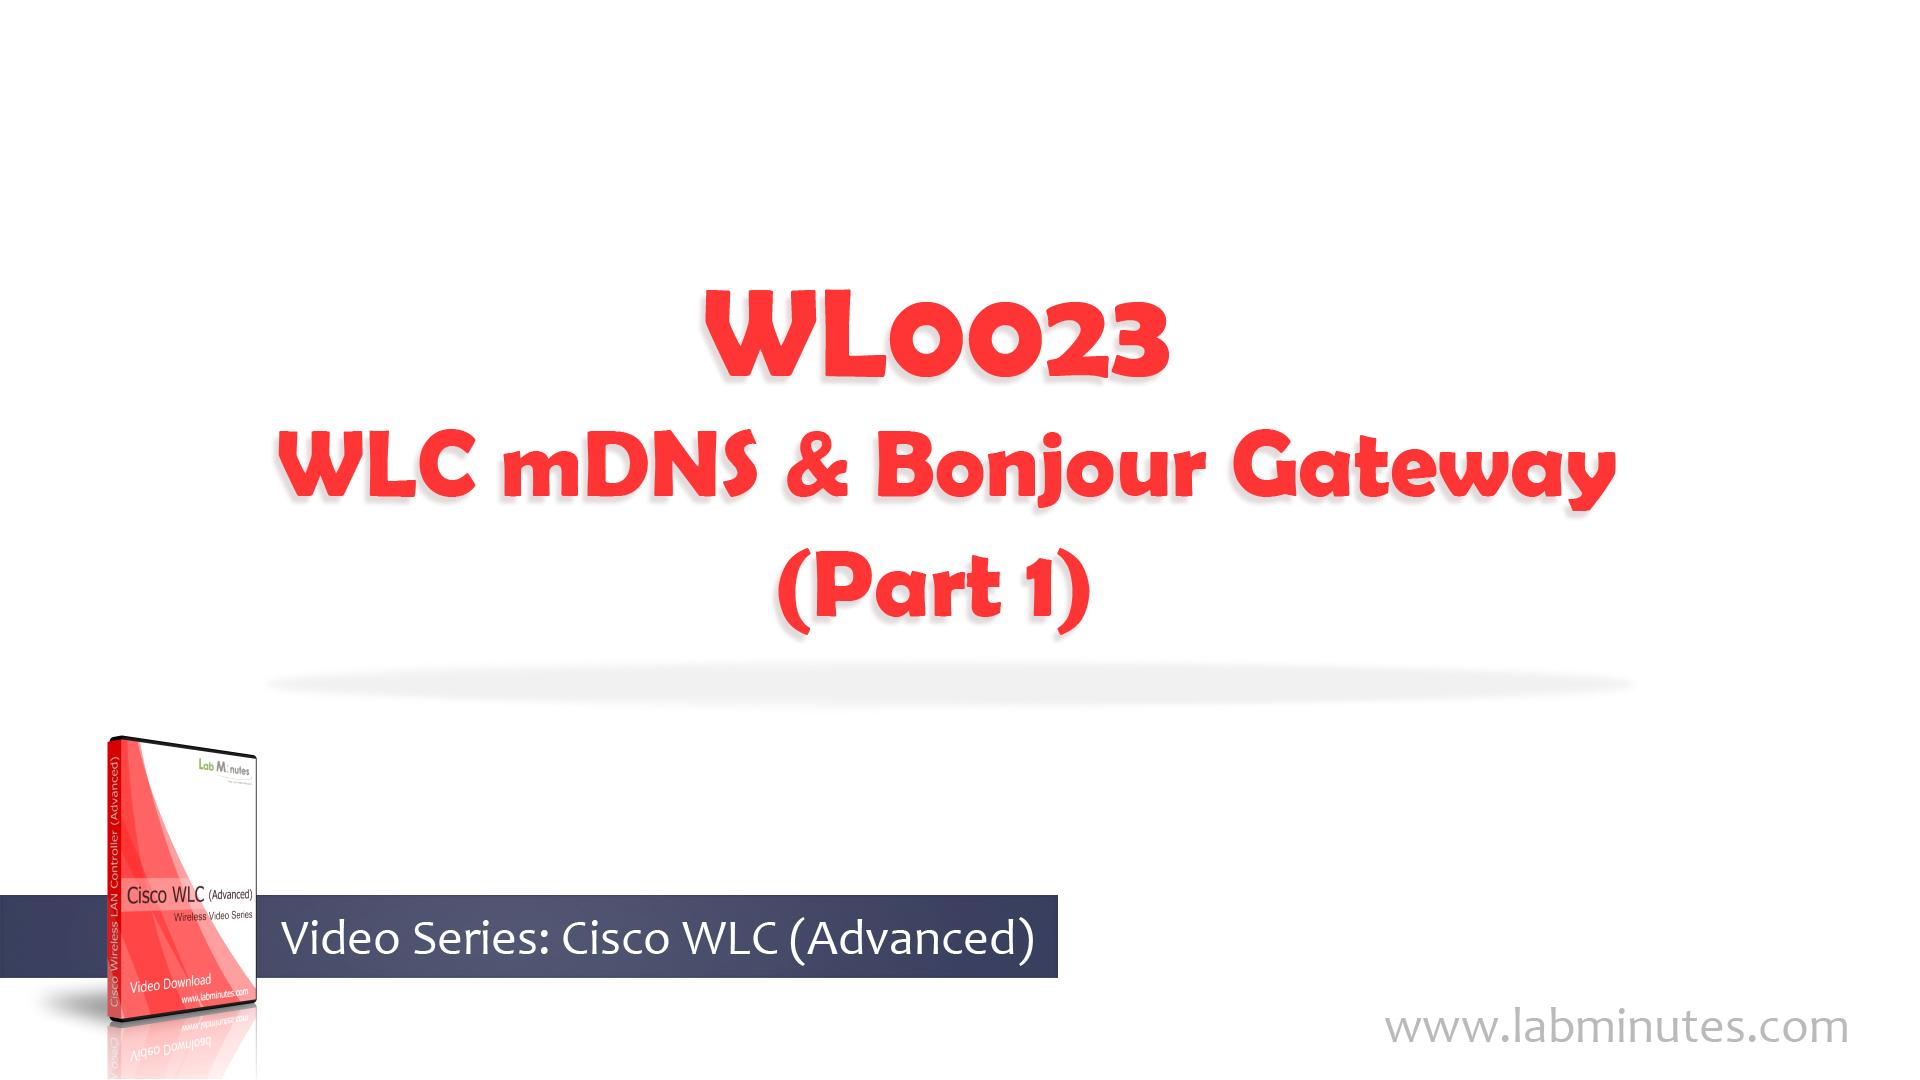 How to Configure Cisco WLC mDNS and Bonjour Gateway (Part 1)